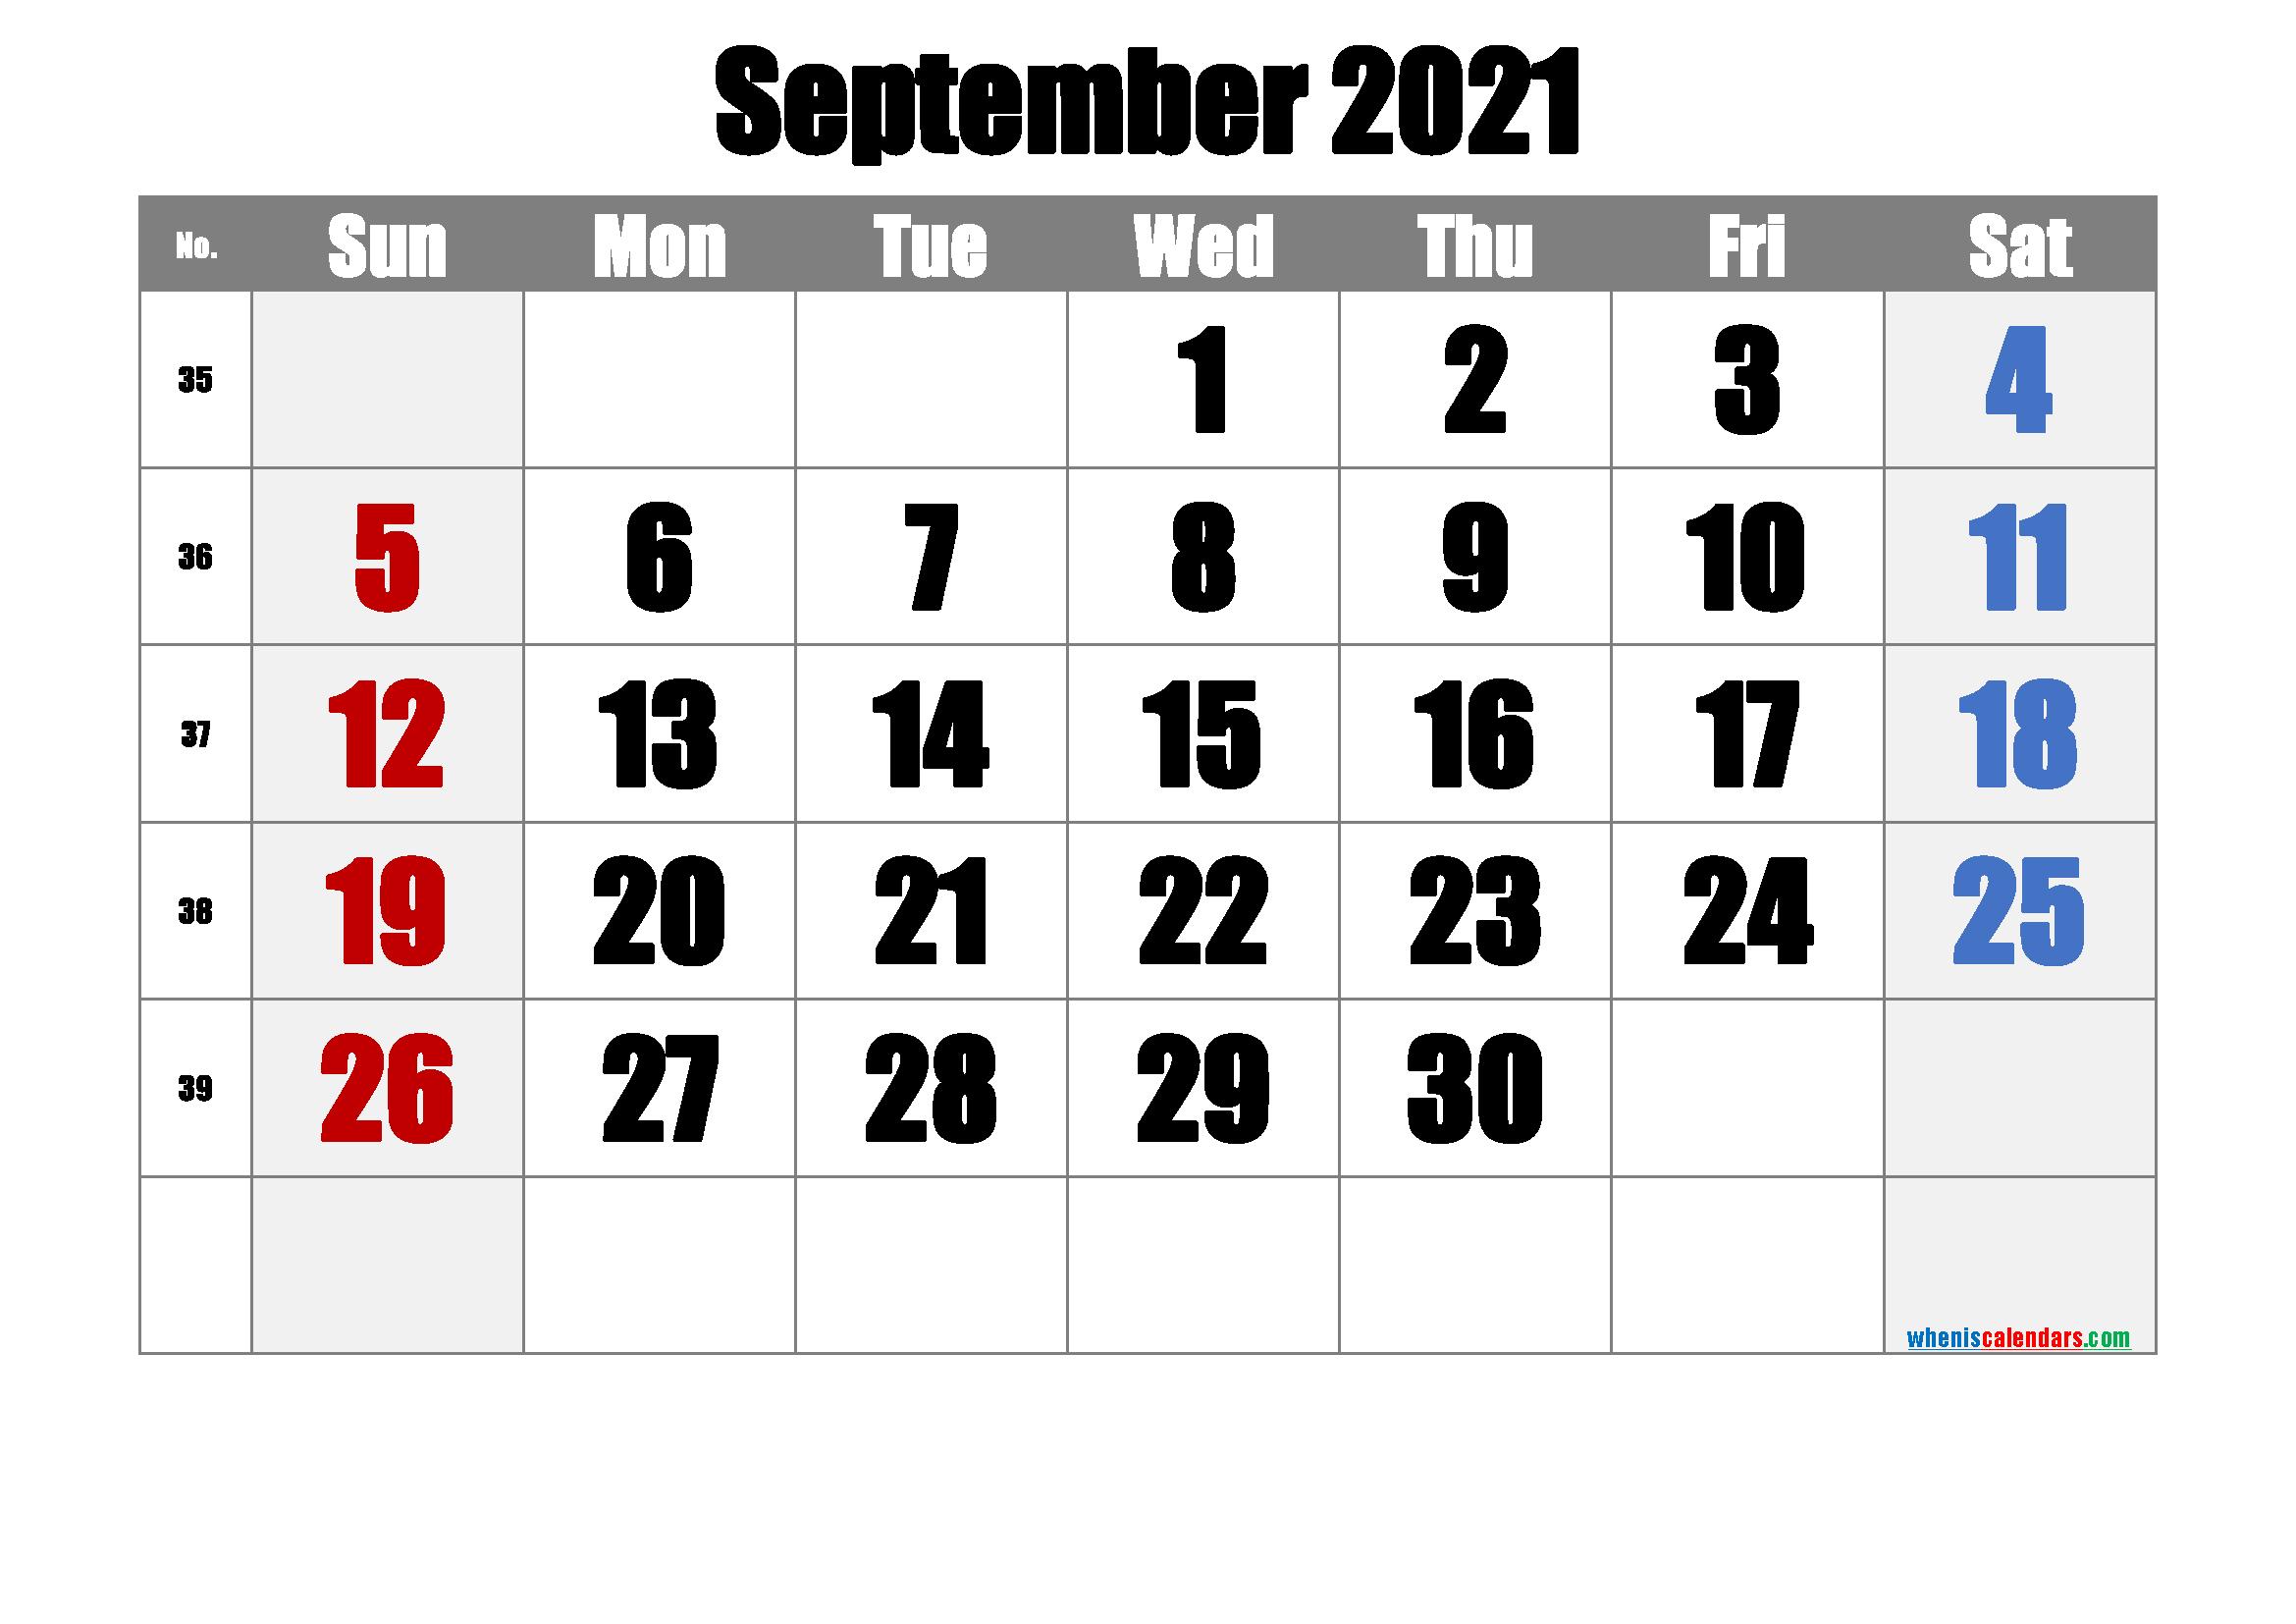 September 2021 Printable Calendar - 6 Templates - Free-Free Printable Calendar 2021 4 Months Per Page May August